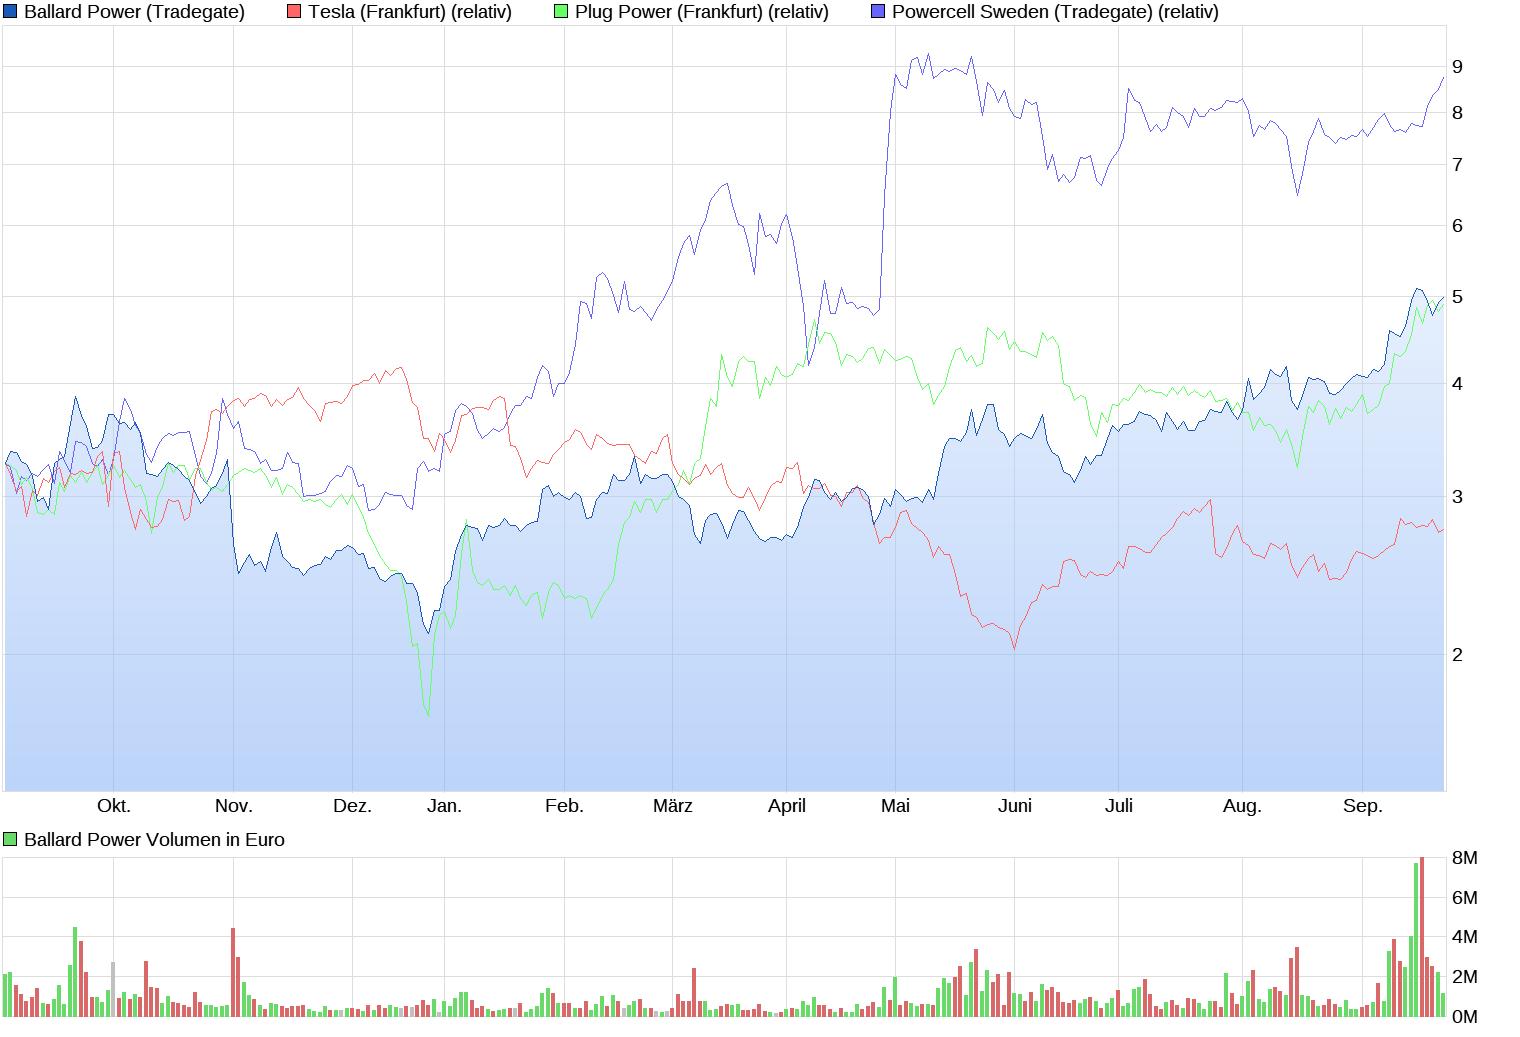 chart_year_ballardpower_(1).png